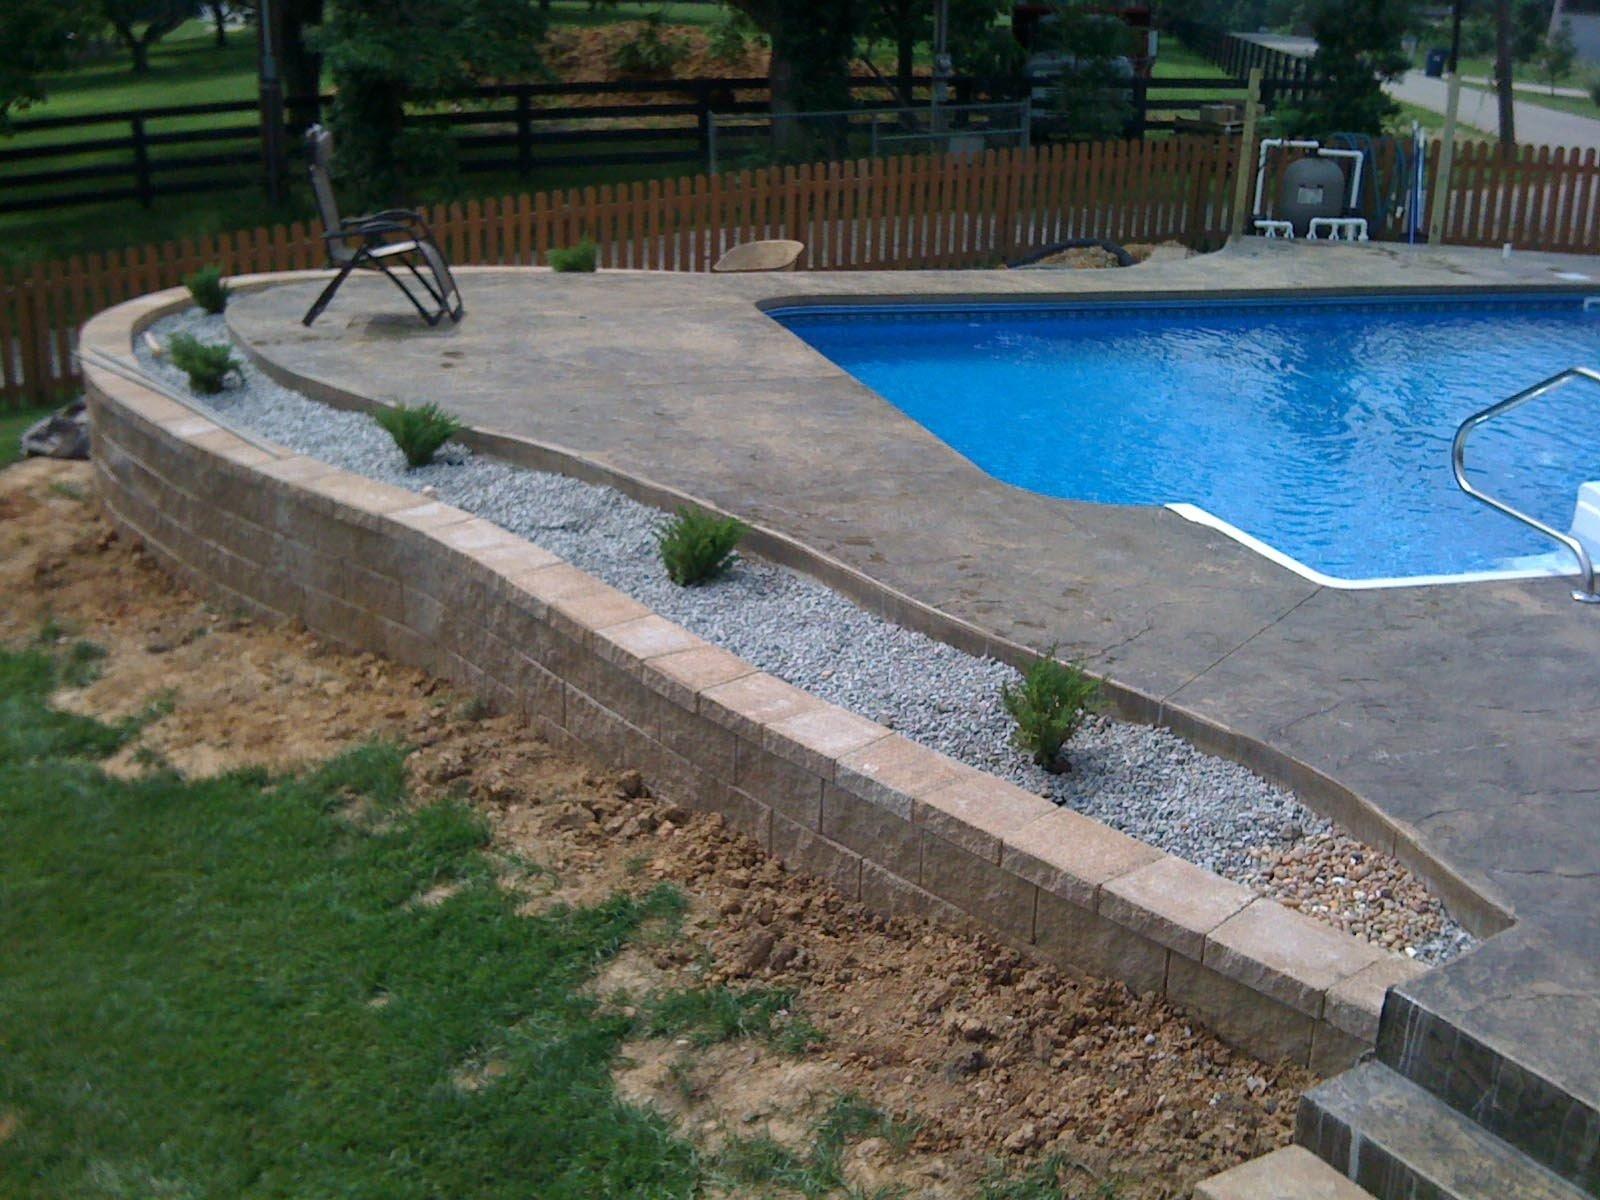 10 Elegant Pool Deck Ideas For Inground Pools pool deck ideas for inground pools with backyard design 2021